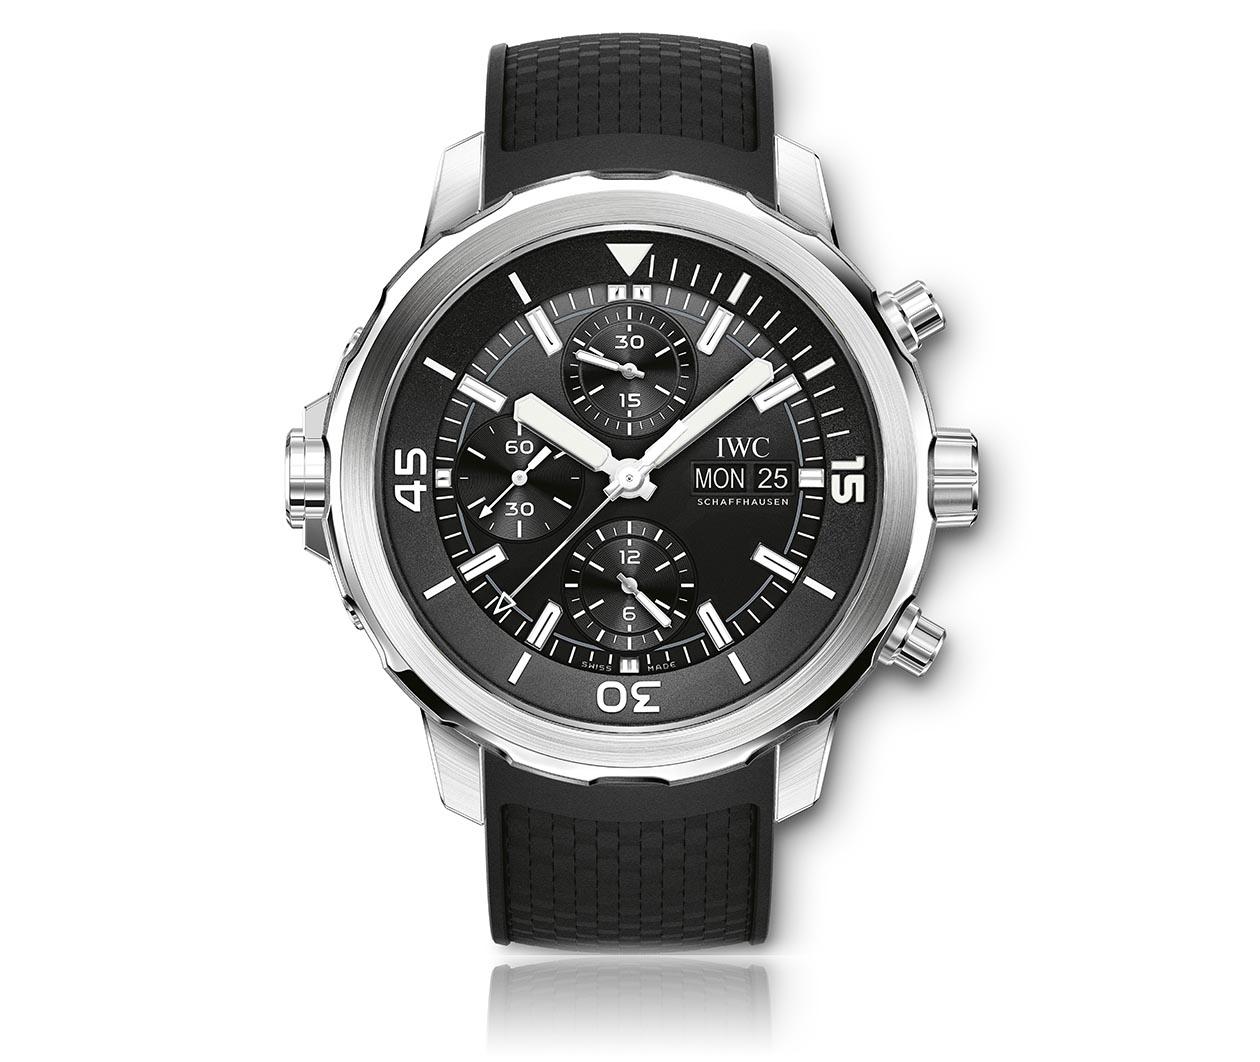 IWC Aquatimer Chronograph IW376803 Carousel 1 FINAL